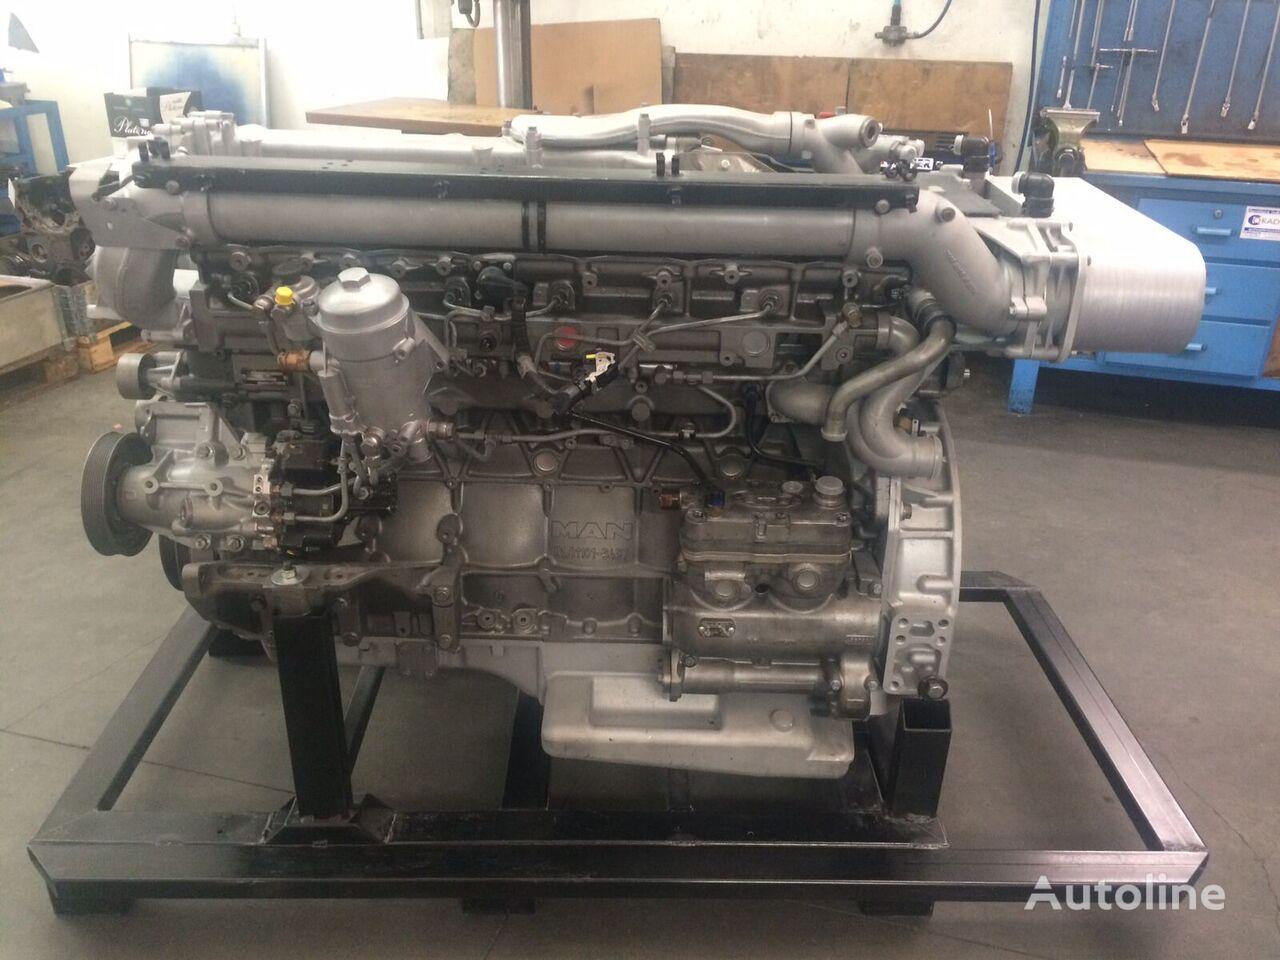 MAN D2676 LOH27 - 480CV - EEV - BUS motor para autobús